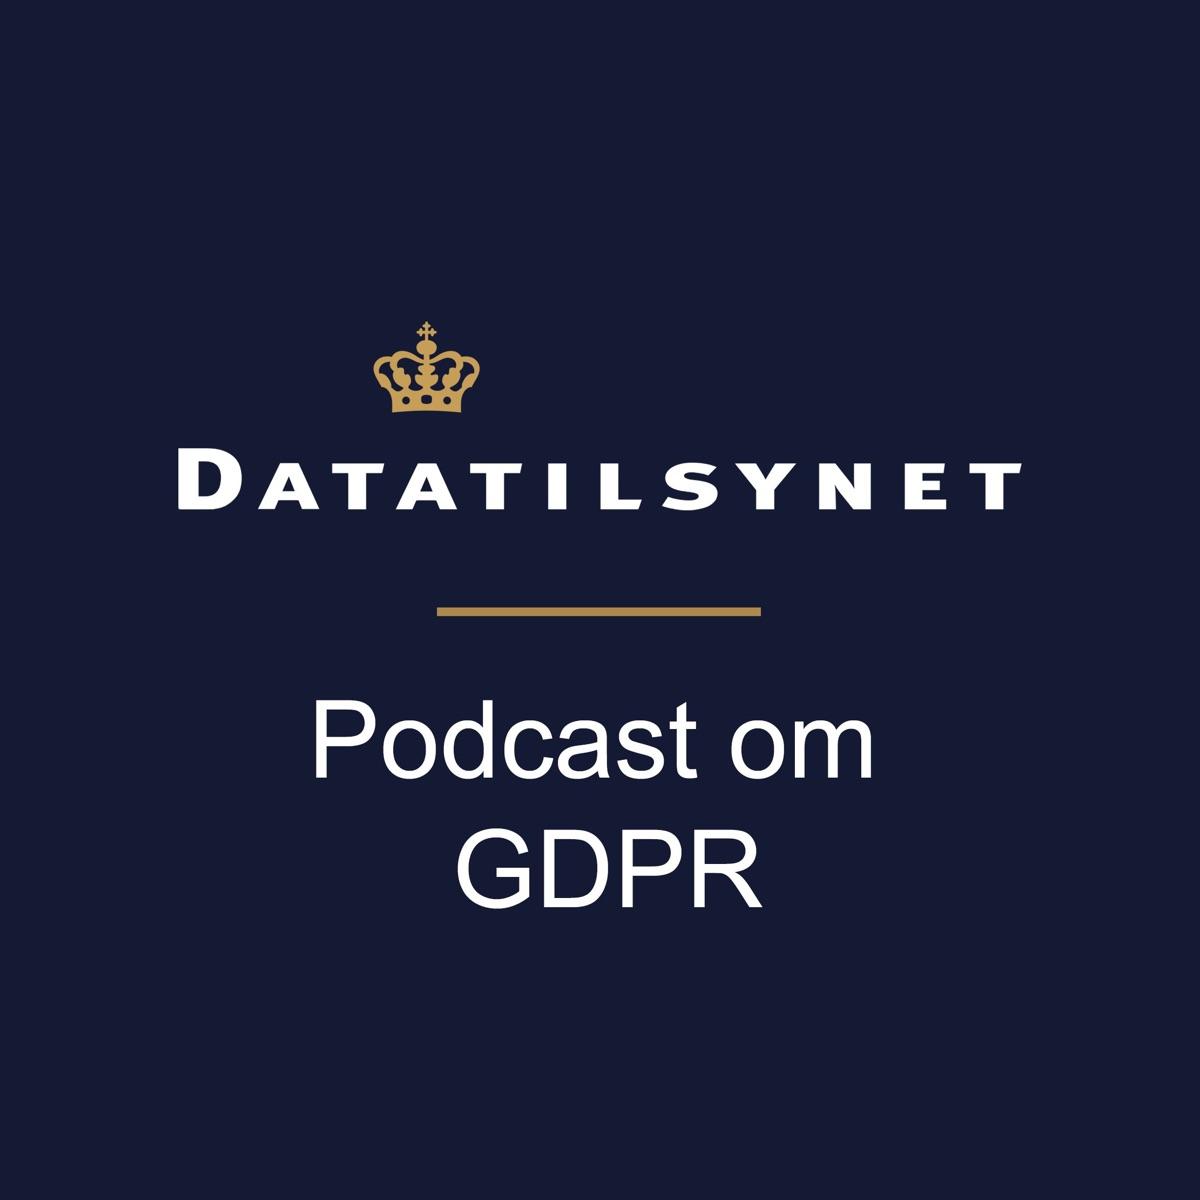 Datatilsynet podcast – bliv klogere på GDPR